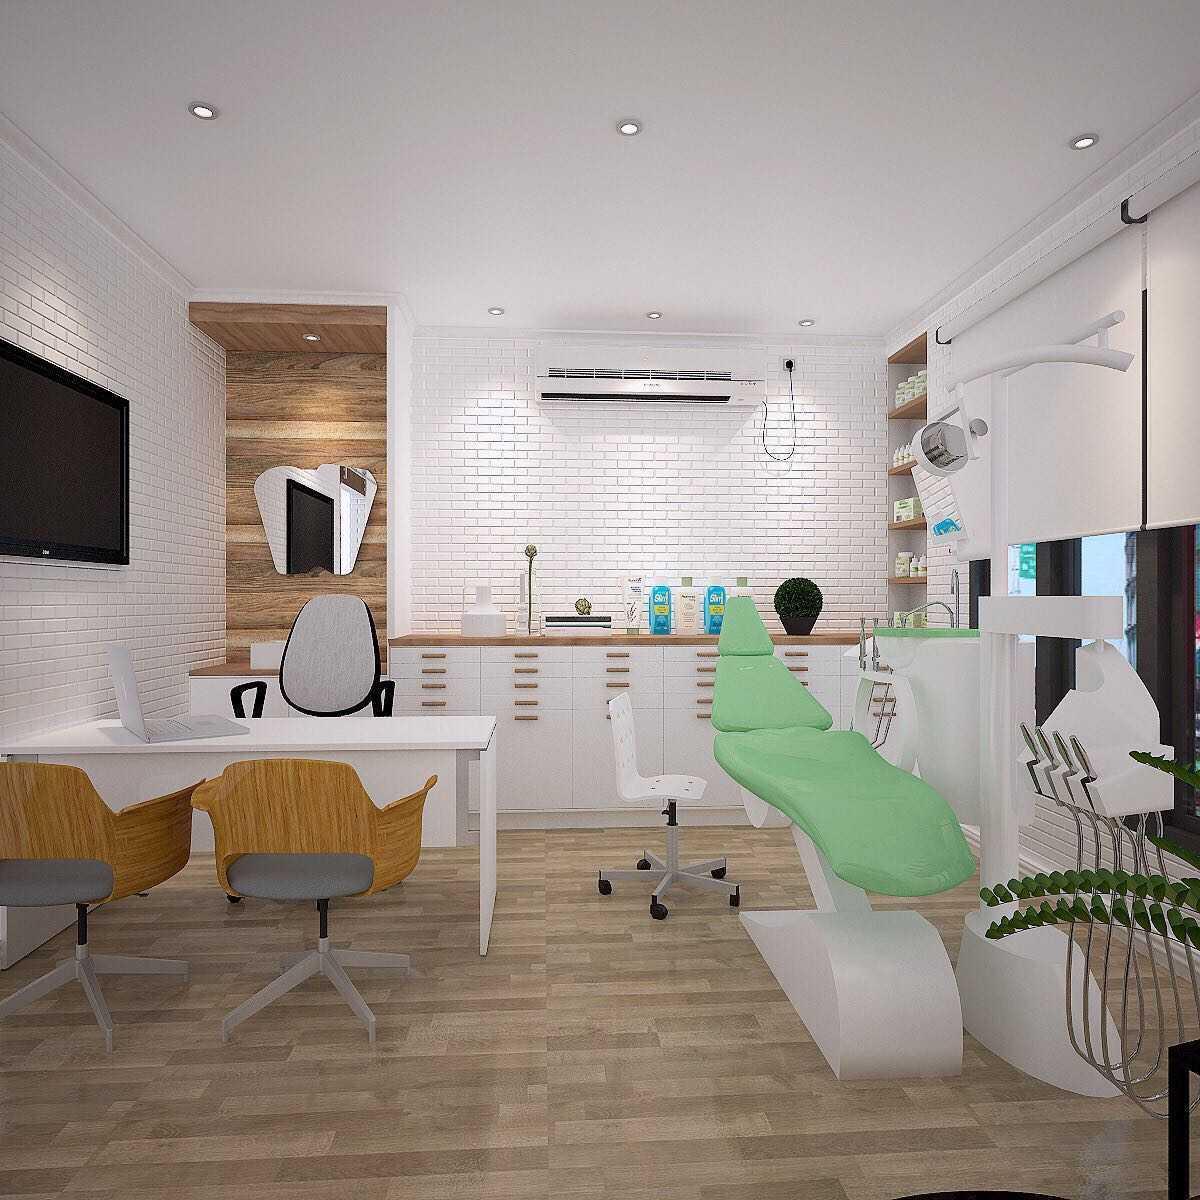 Ky Interior Design Klinik Gigi Noto Puri Indah Daerah Khusus Ibukota Jakarta, Indonesia Daerah Khusus Ibukota Jakarta, Indonesia Doctor Room   48905